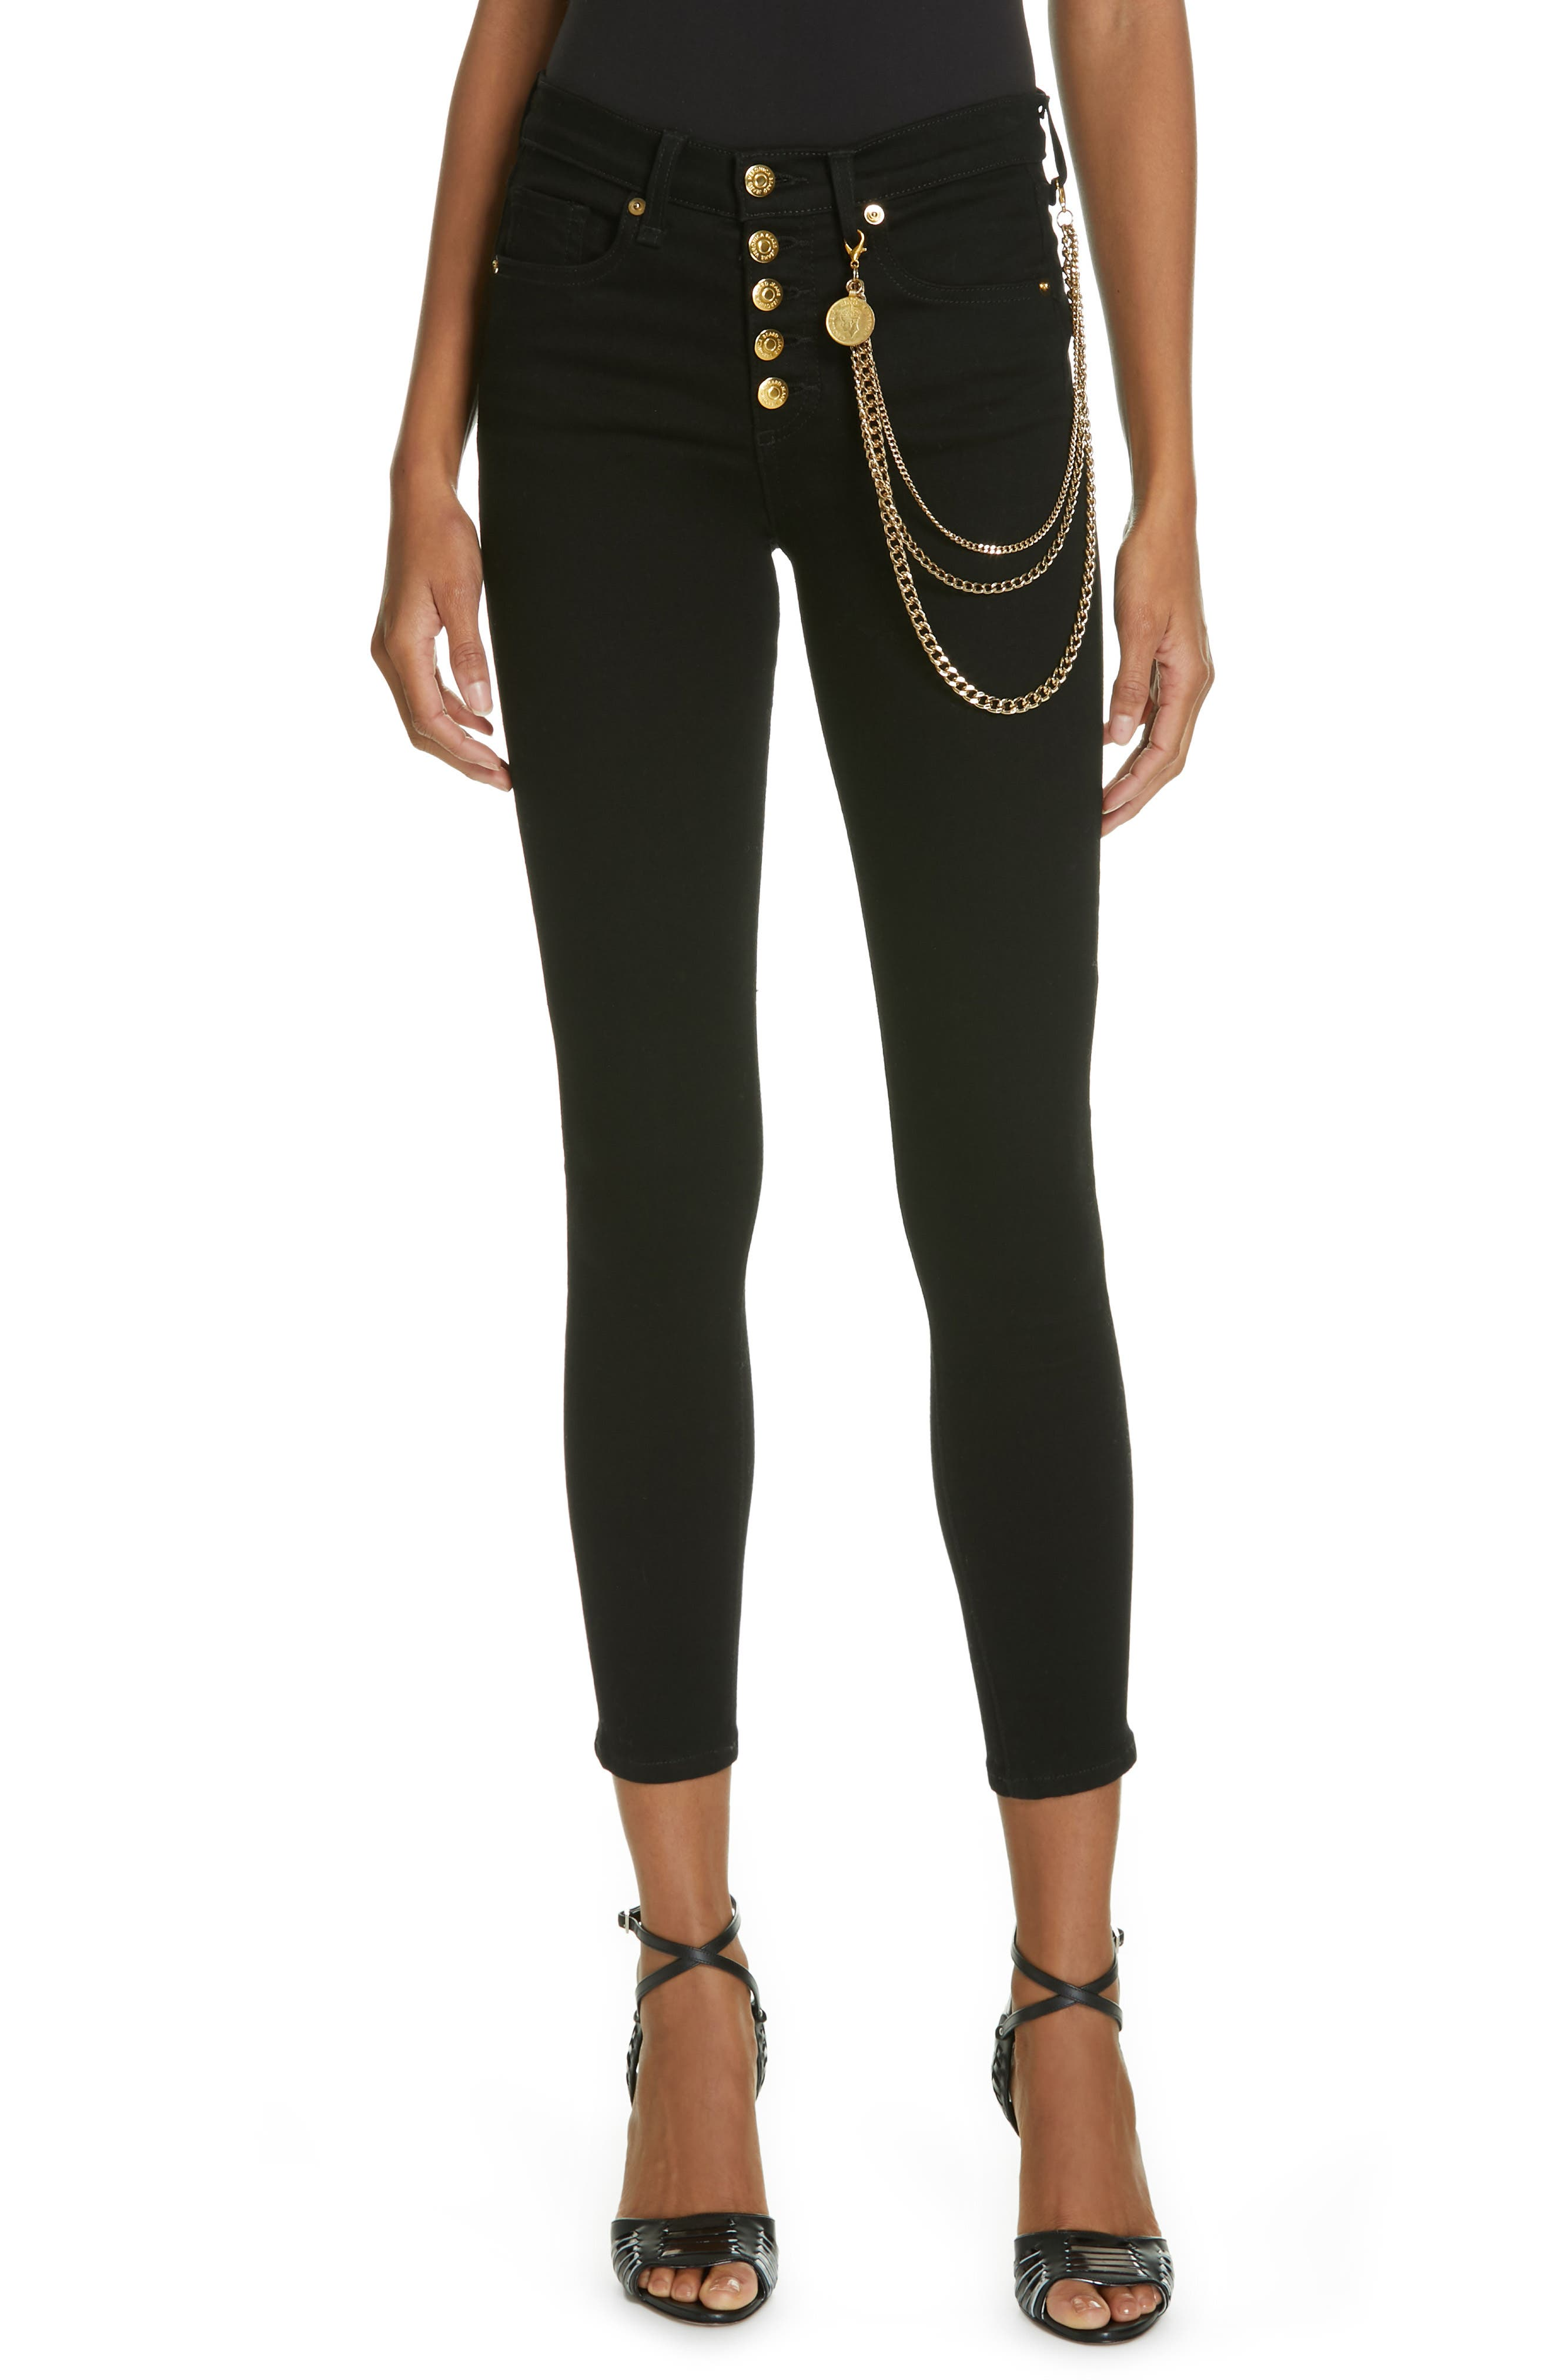 Debbie 10 Chain Belt High Waist Skinny Jeans,                             Main thumbnail 1, color,                             RAVEN